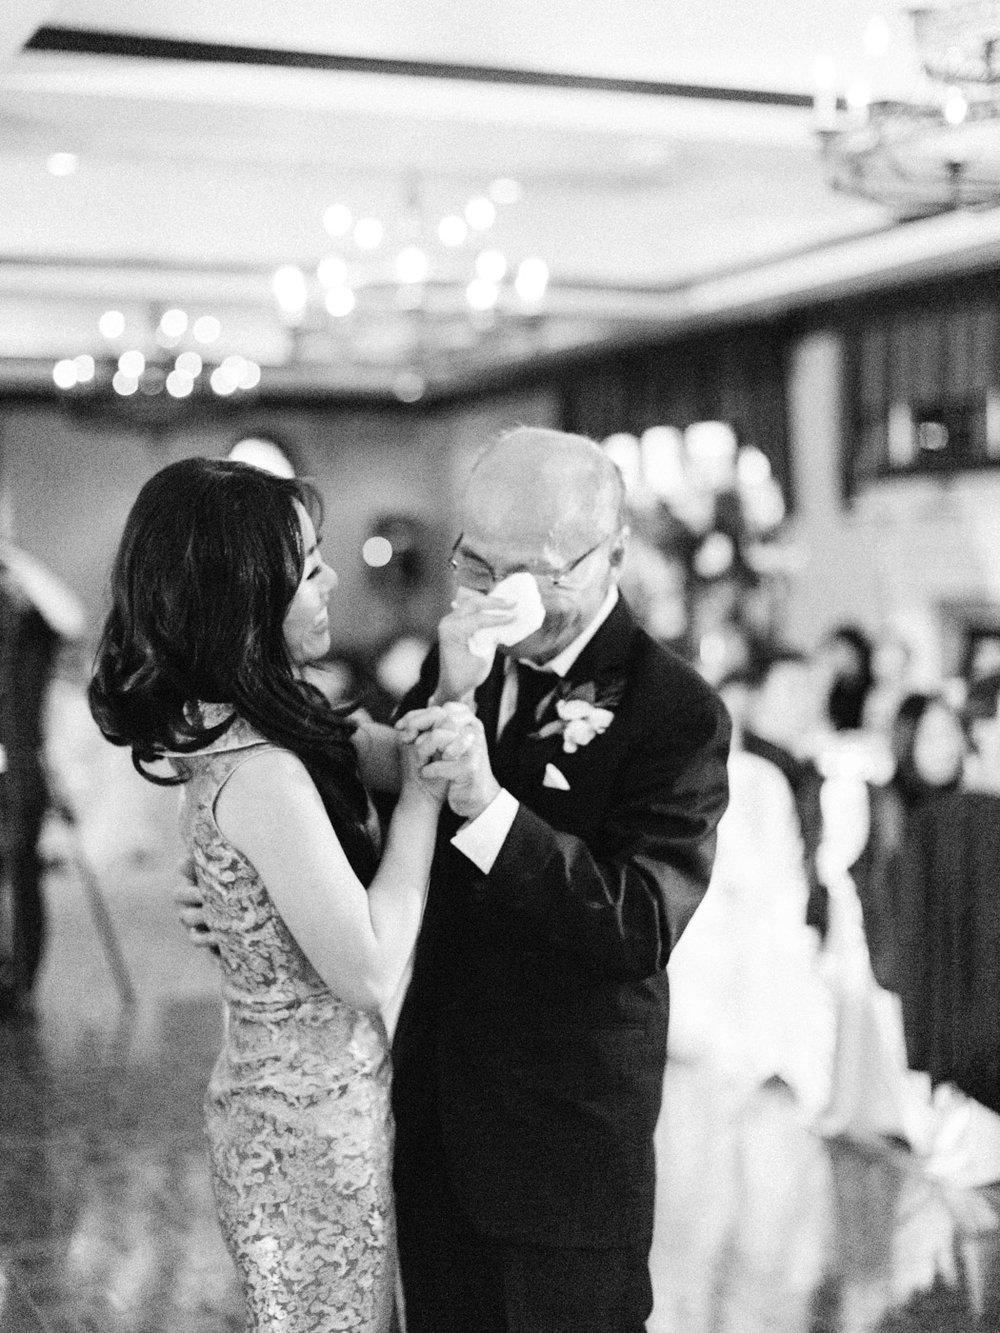 toronto-wedding-photographer-fine-art-documentary-elegant-toronto-golf-club-kings-riding-233.jpg